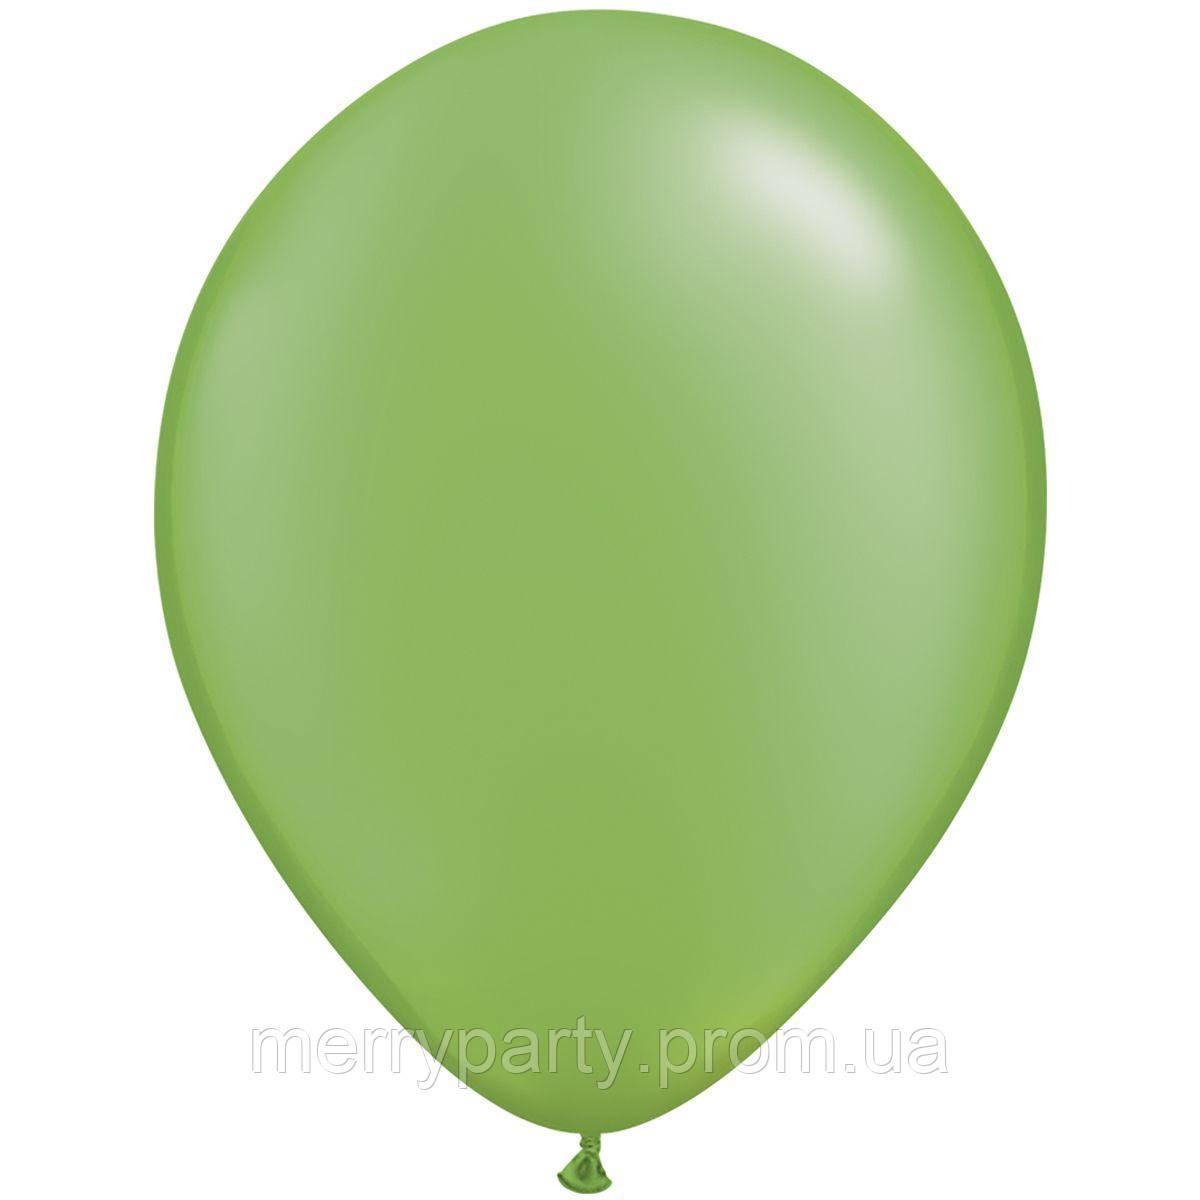 "11"" (28 см) металлик зеленый Pearl Lime green Qualatex США латексный шар"